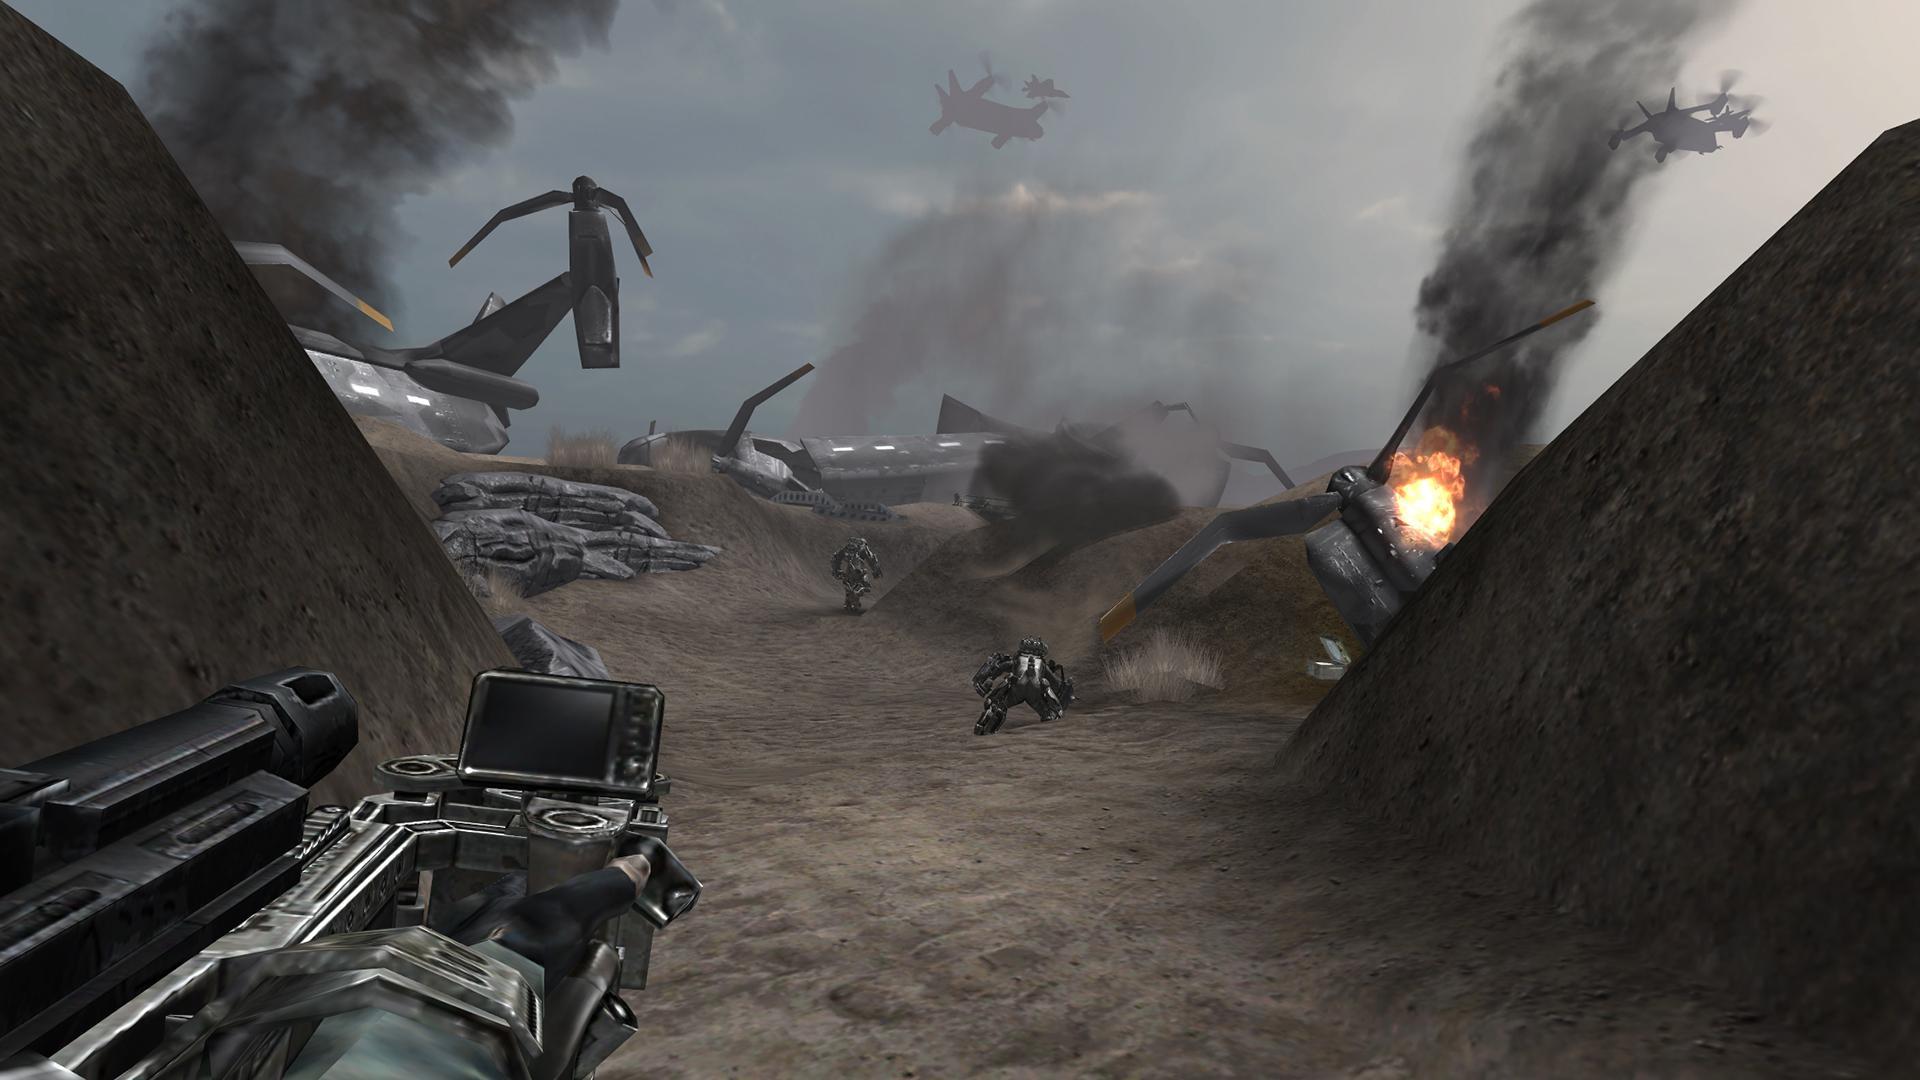 Edge of Tomorrow Game screenshot #3